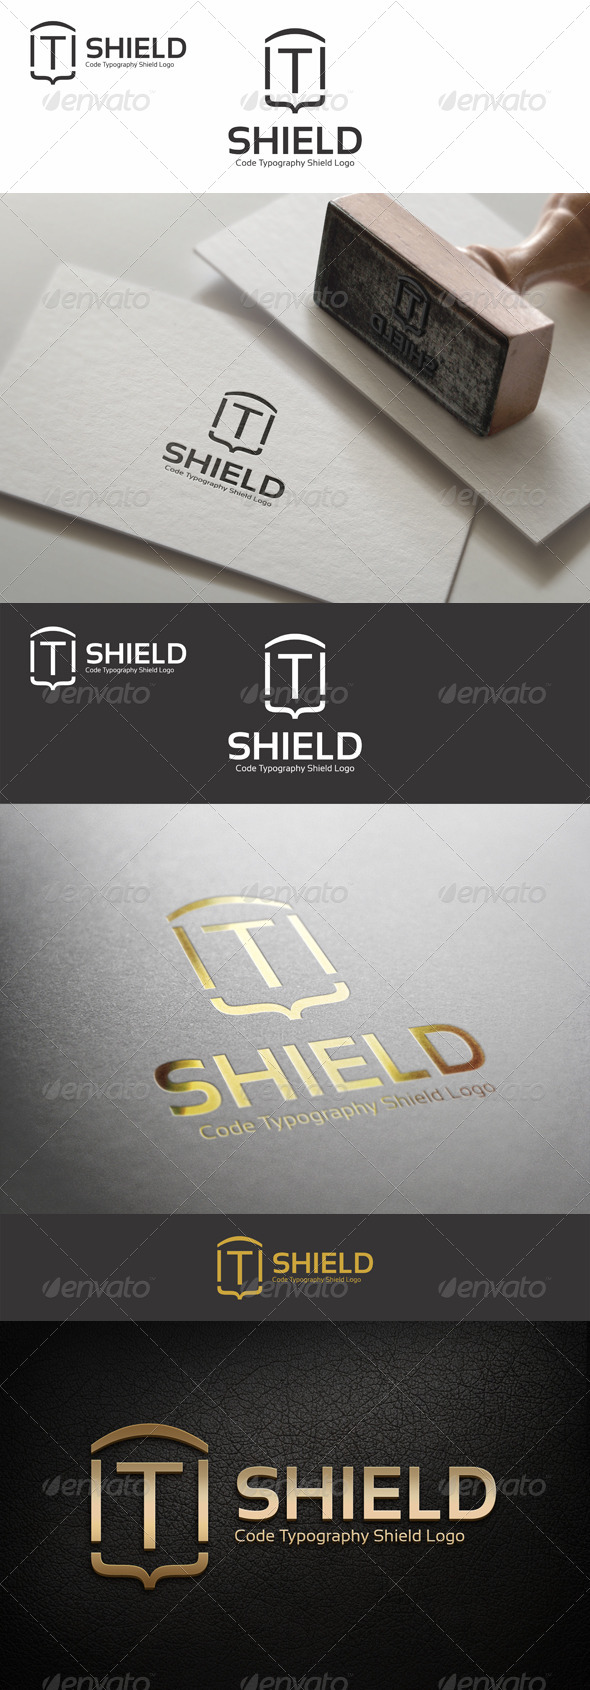 Code Typography Shield Logo - Symbols Logo Templates